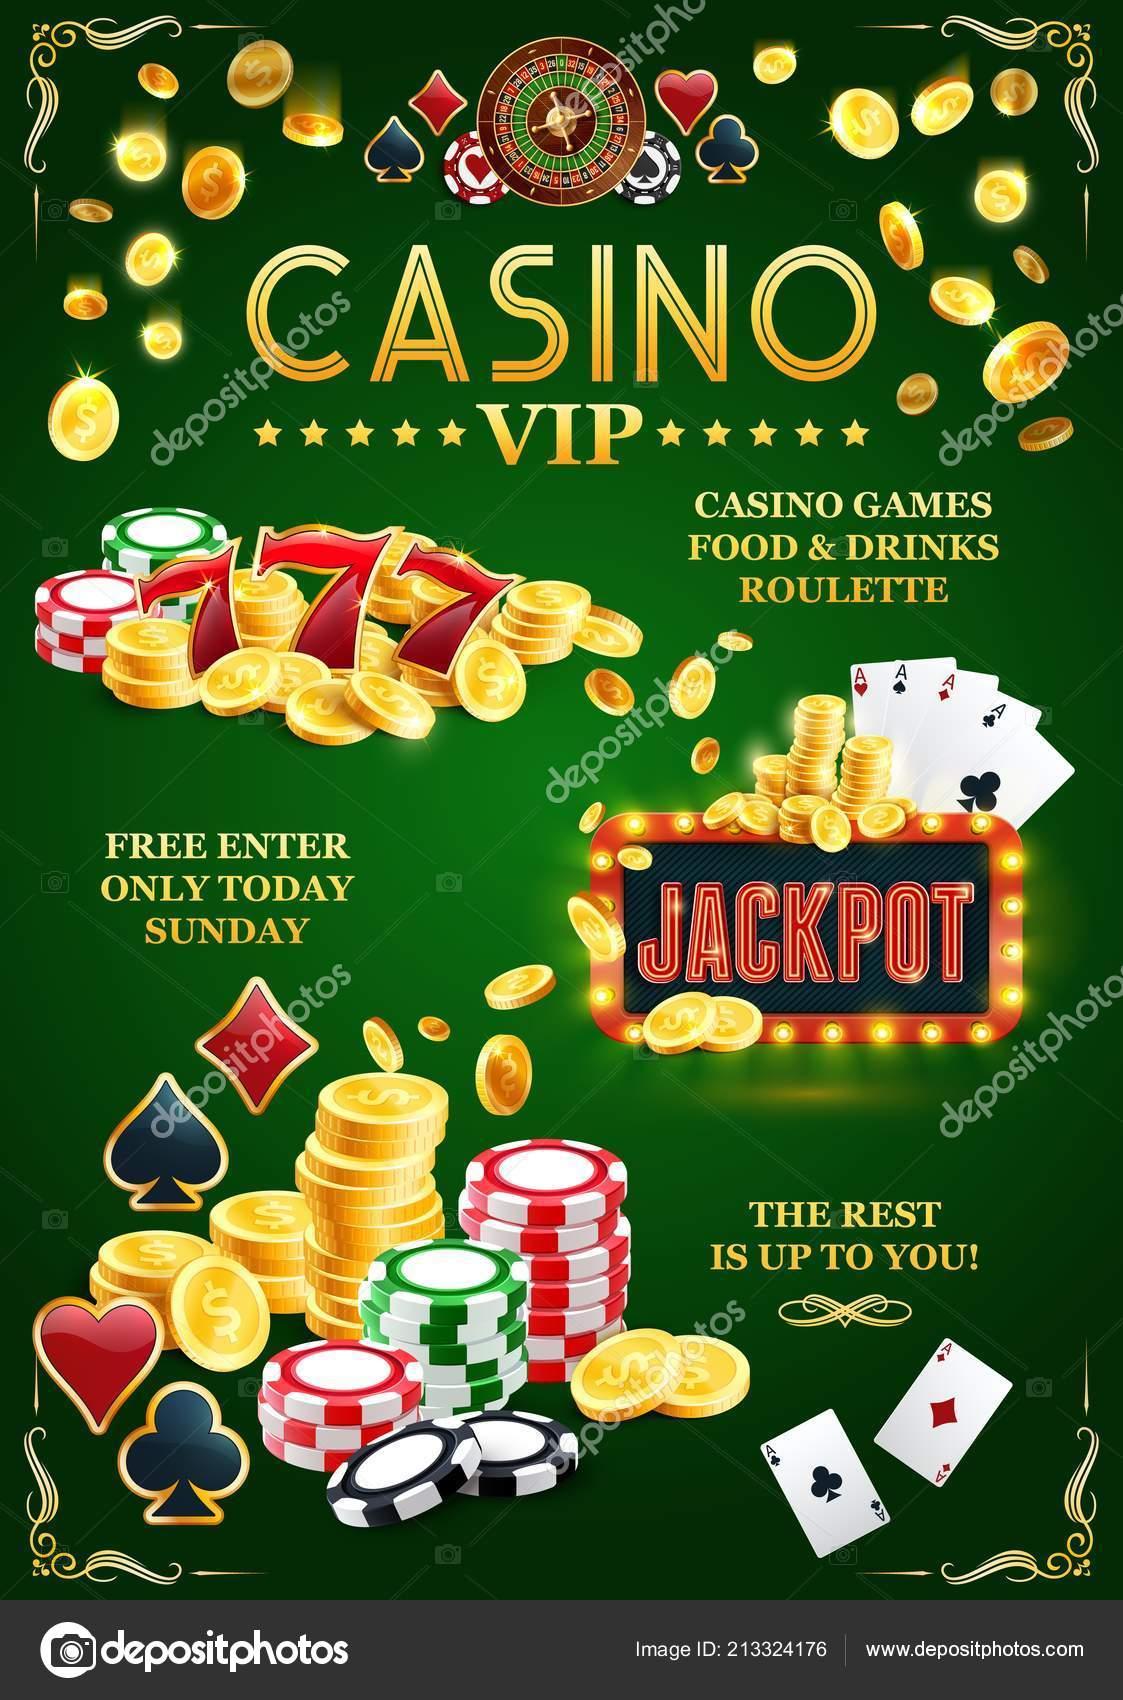 онлайн джекпот казино